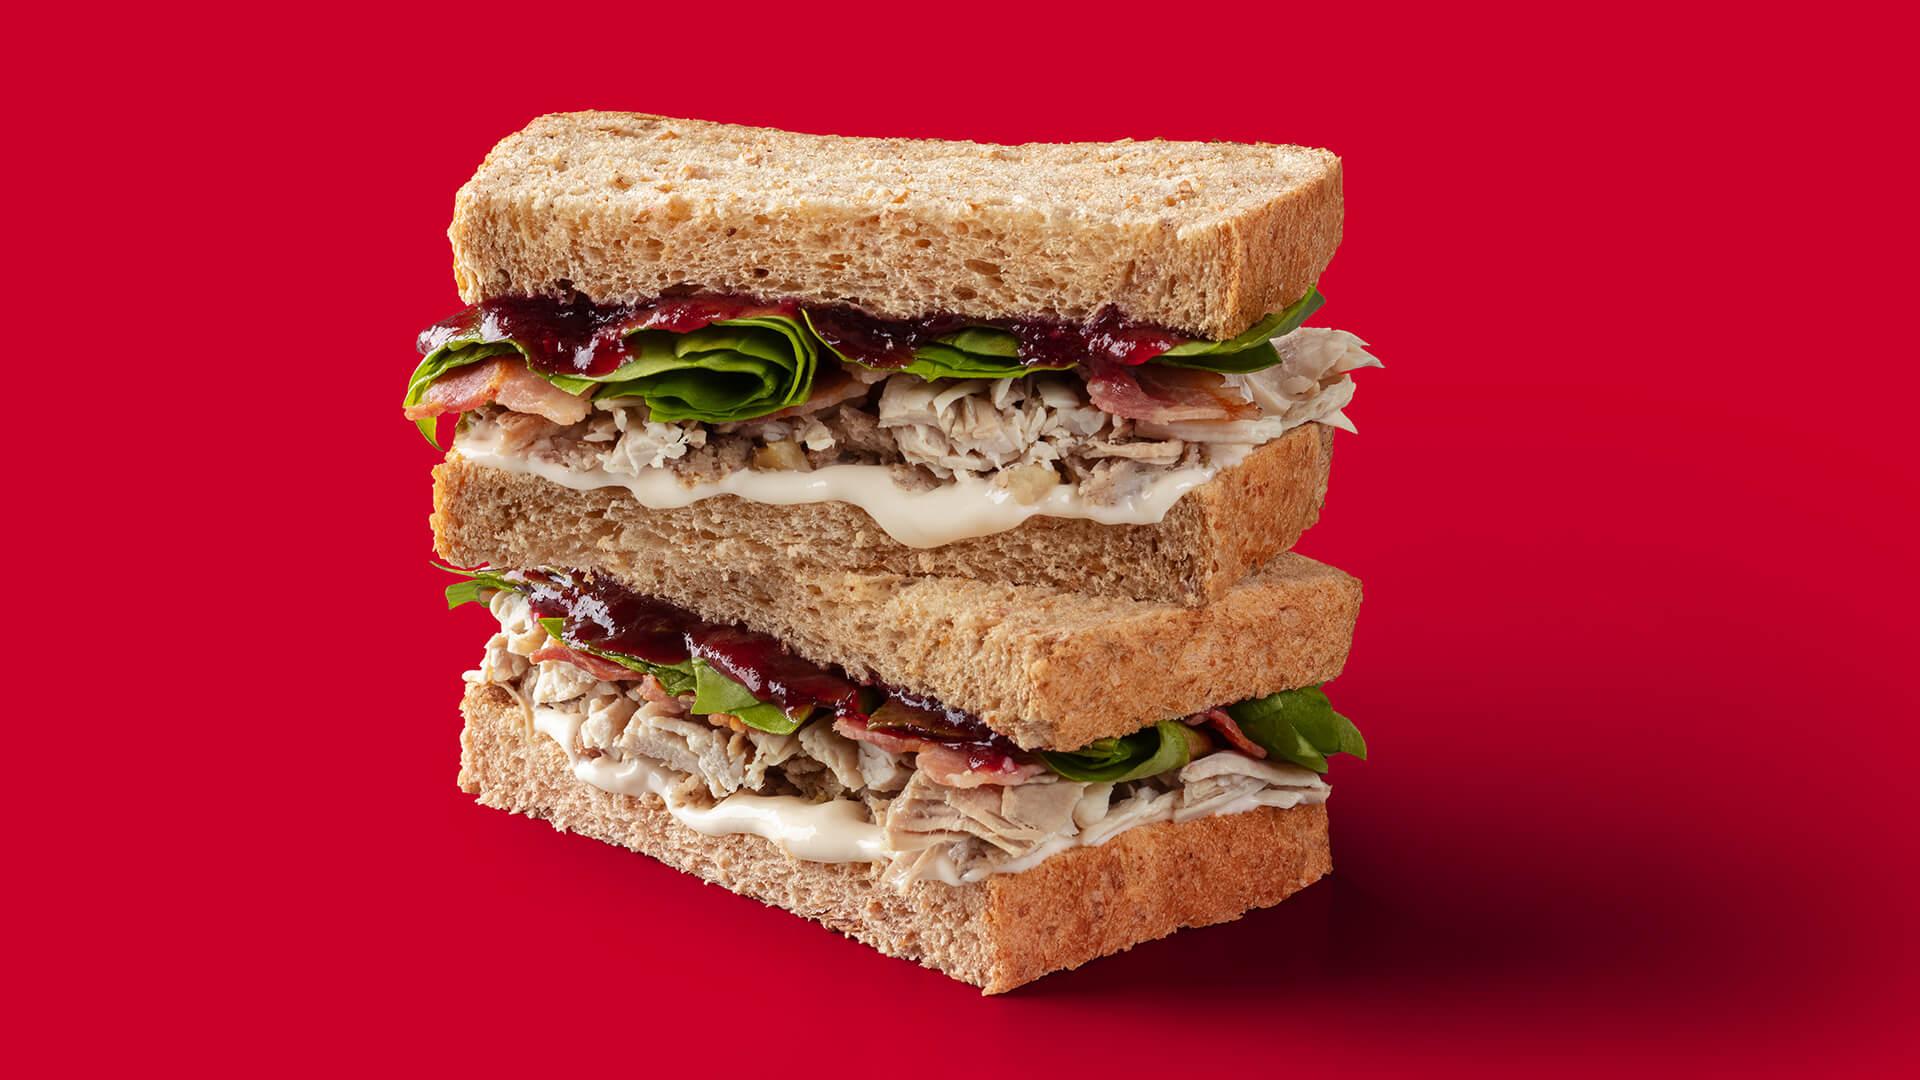 'Tis the Season Turkey Sandwich